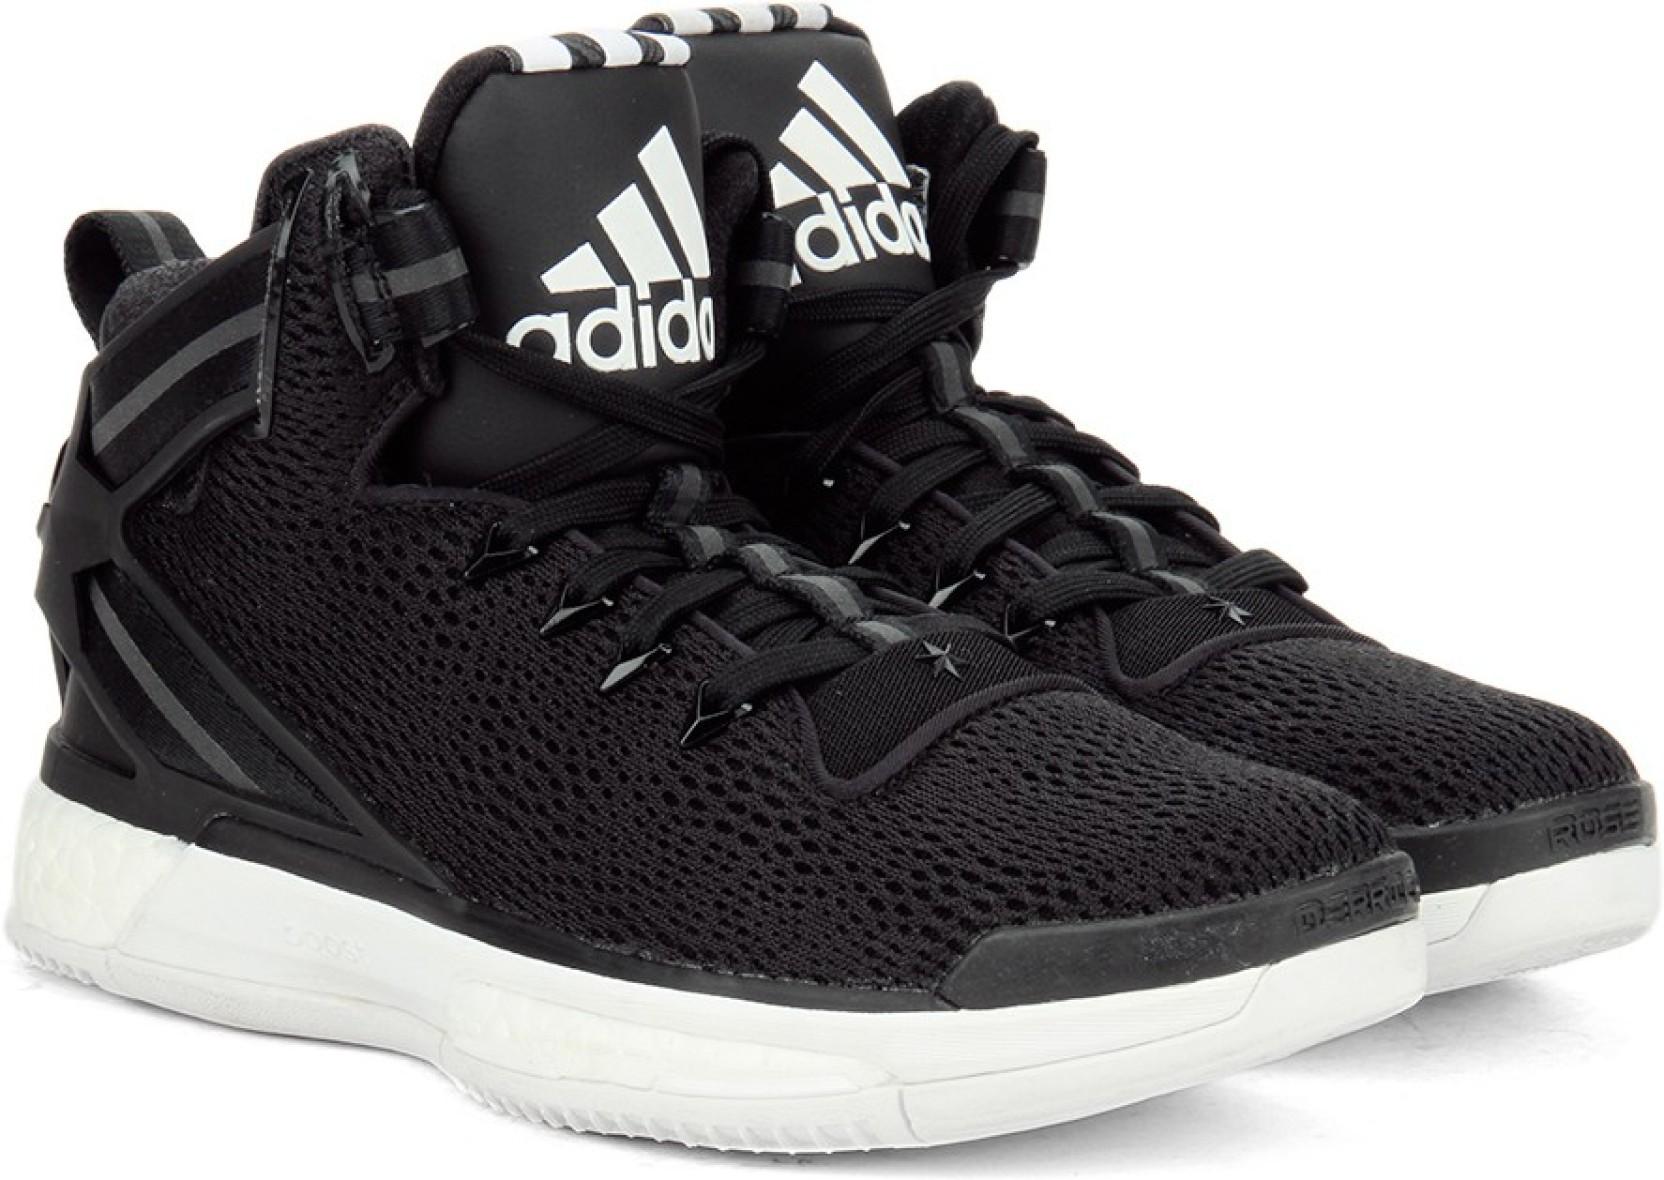 ADIDAS D ROSE 6 BOOST Men Basketball Shoes For Men - Buy CBLACK ... 926cefd3dac6